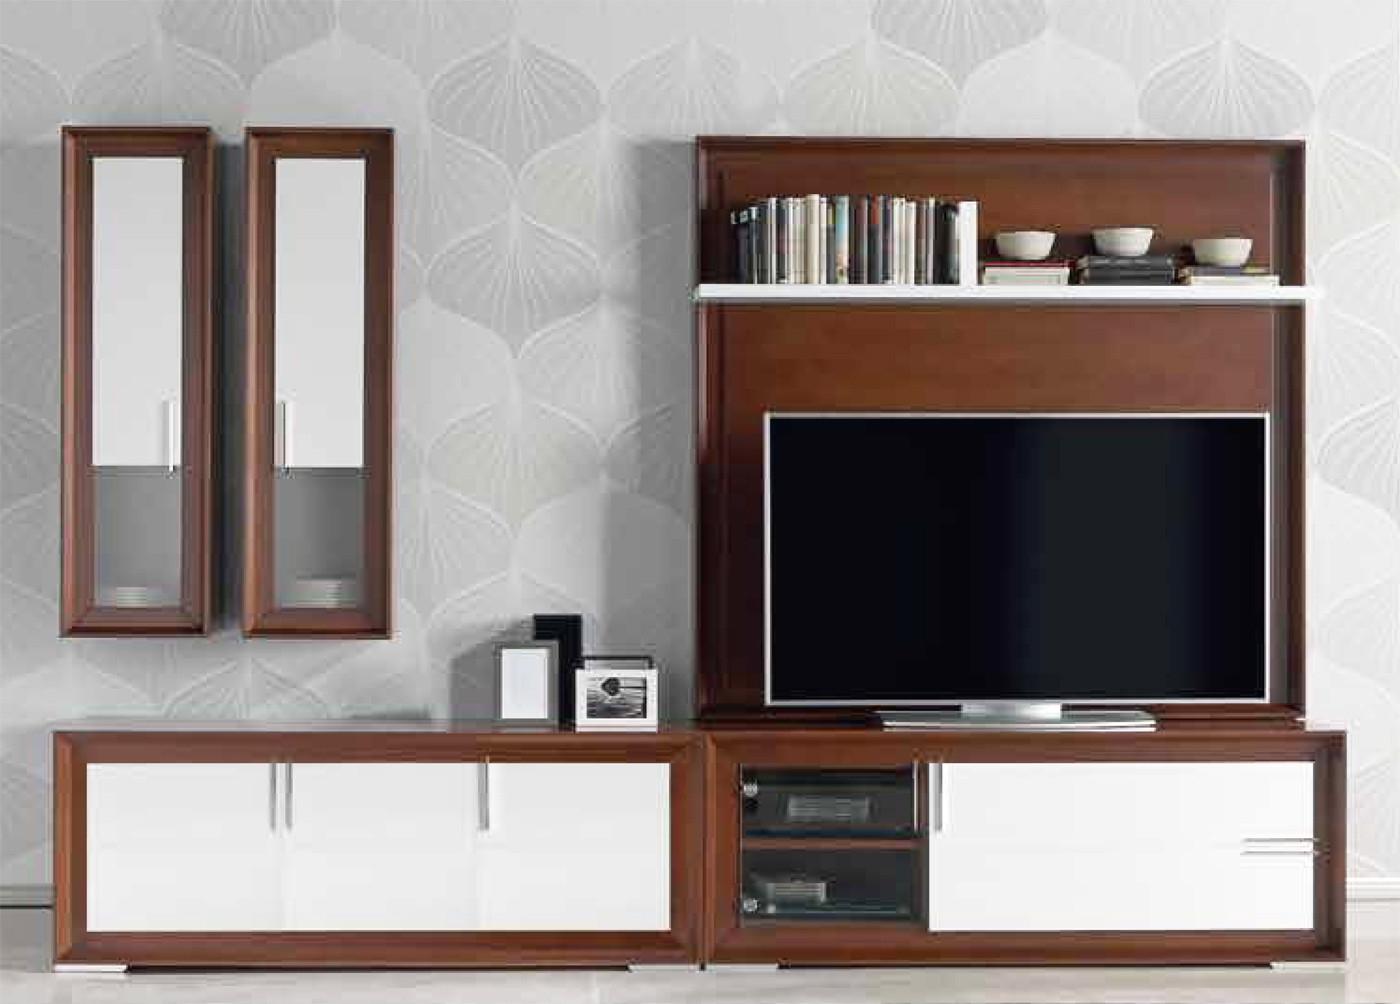 Muebles Modulares E9dx Muebles Modulares Con Mà Dulo De Televisià N En Madera De Haya